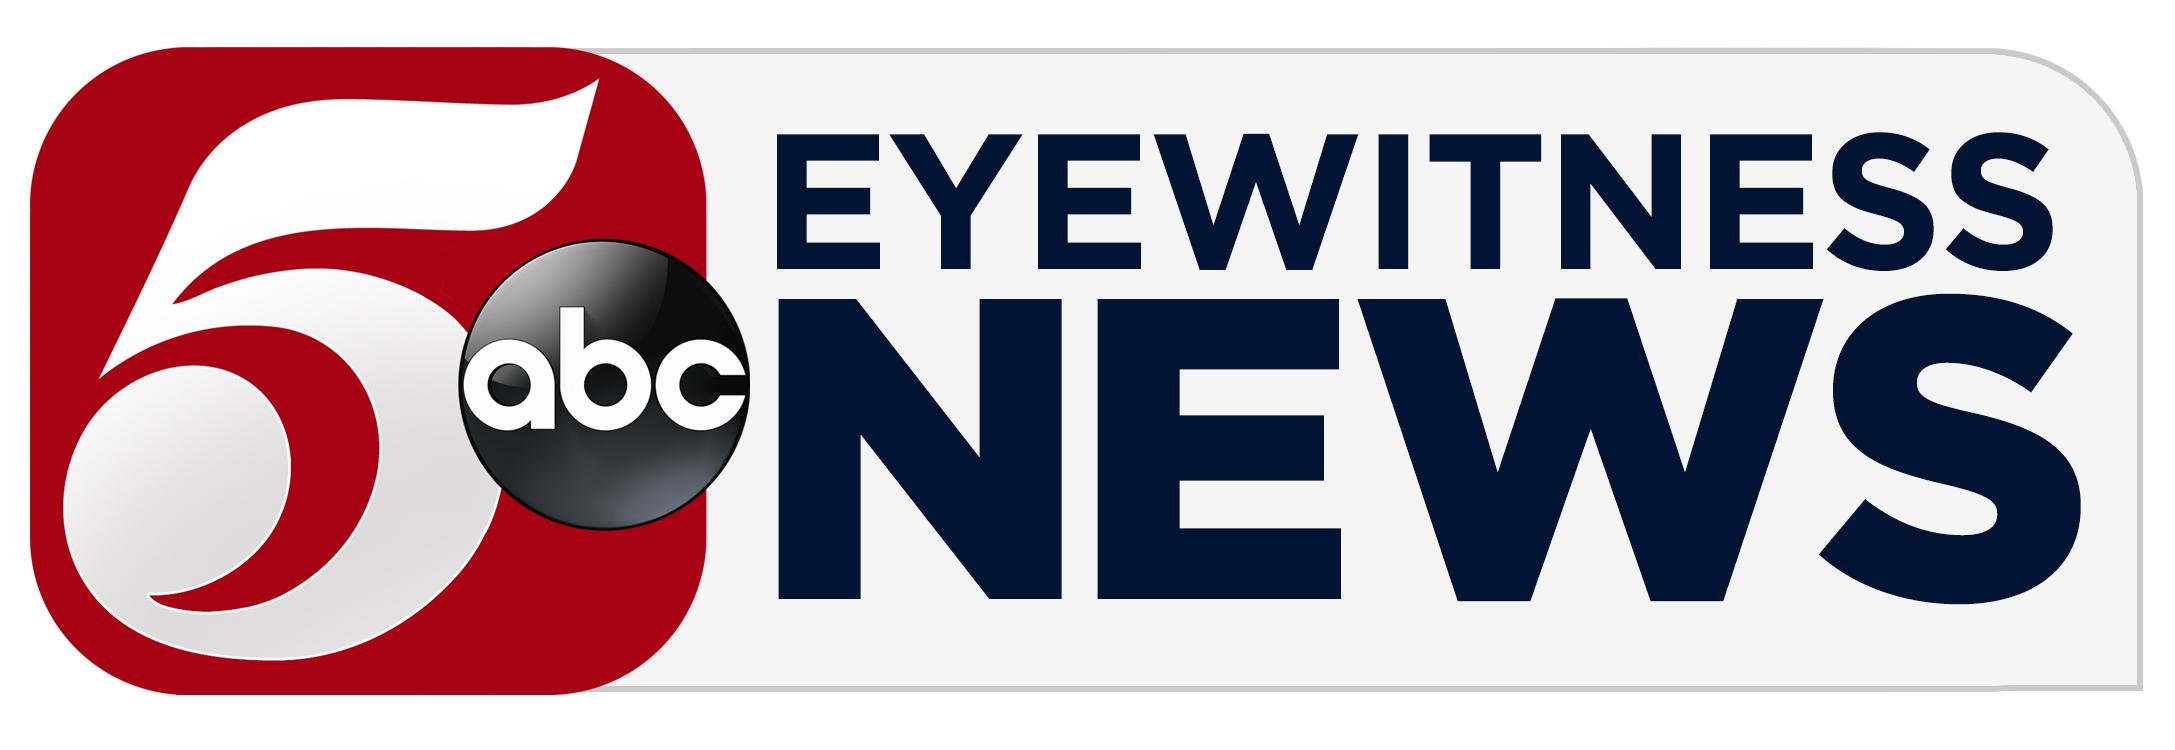 ABC 5 Eyewitness News logo KSTP